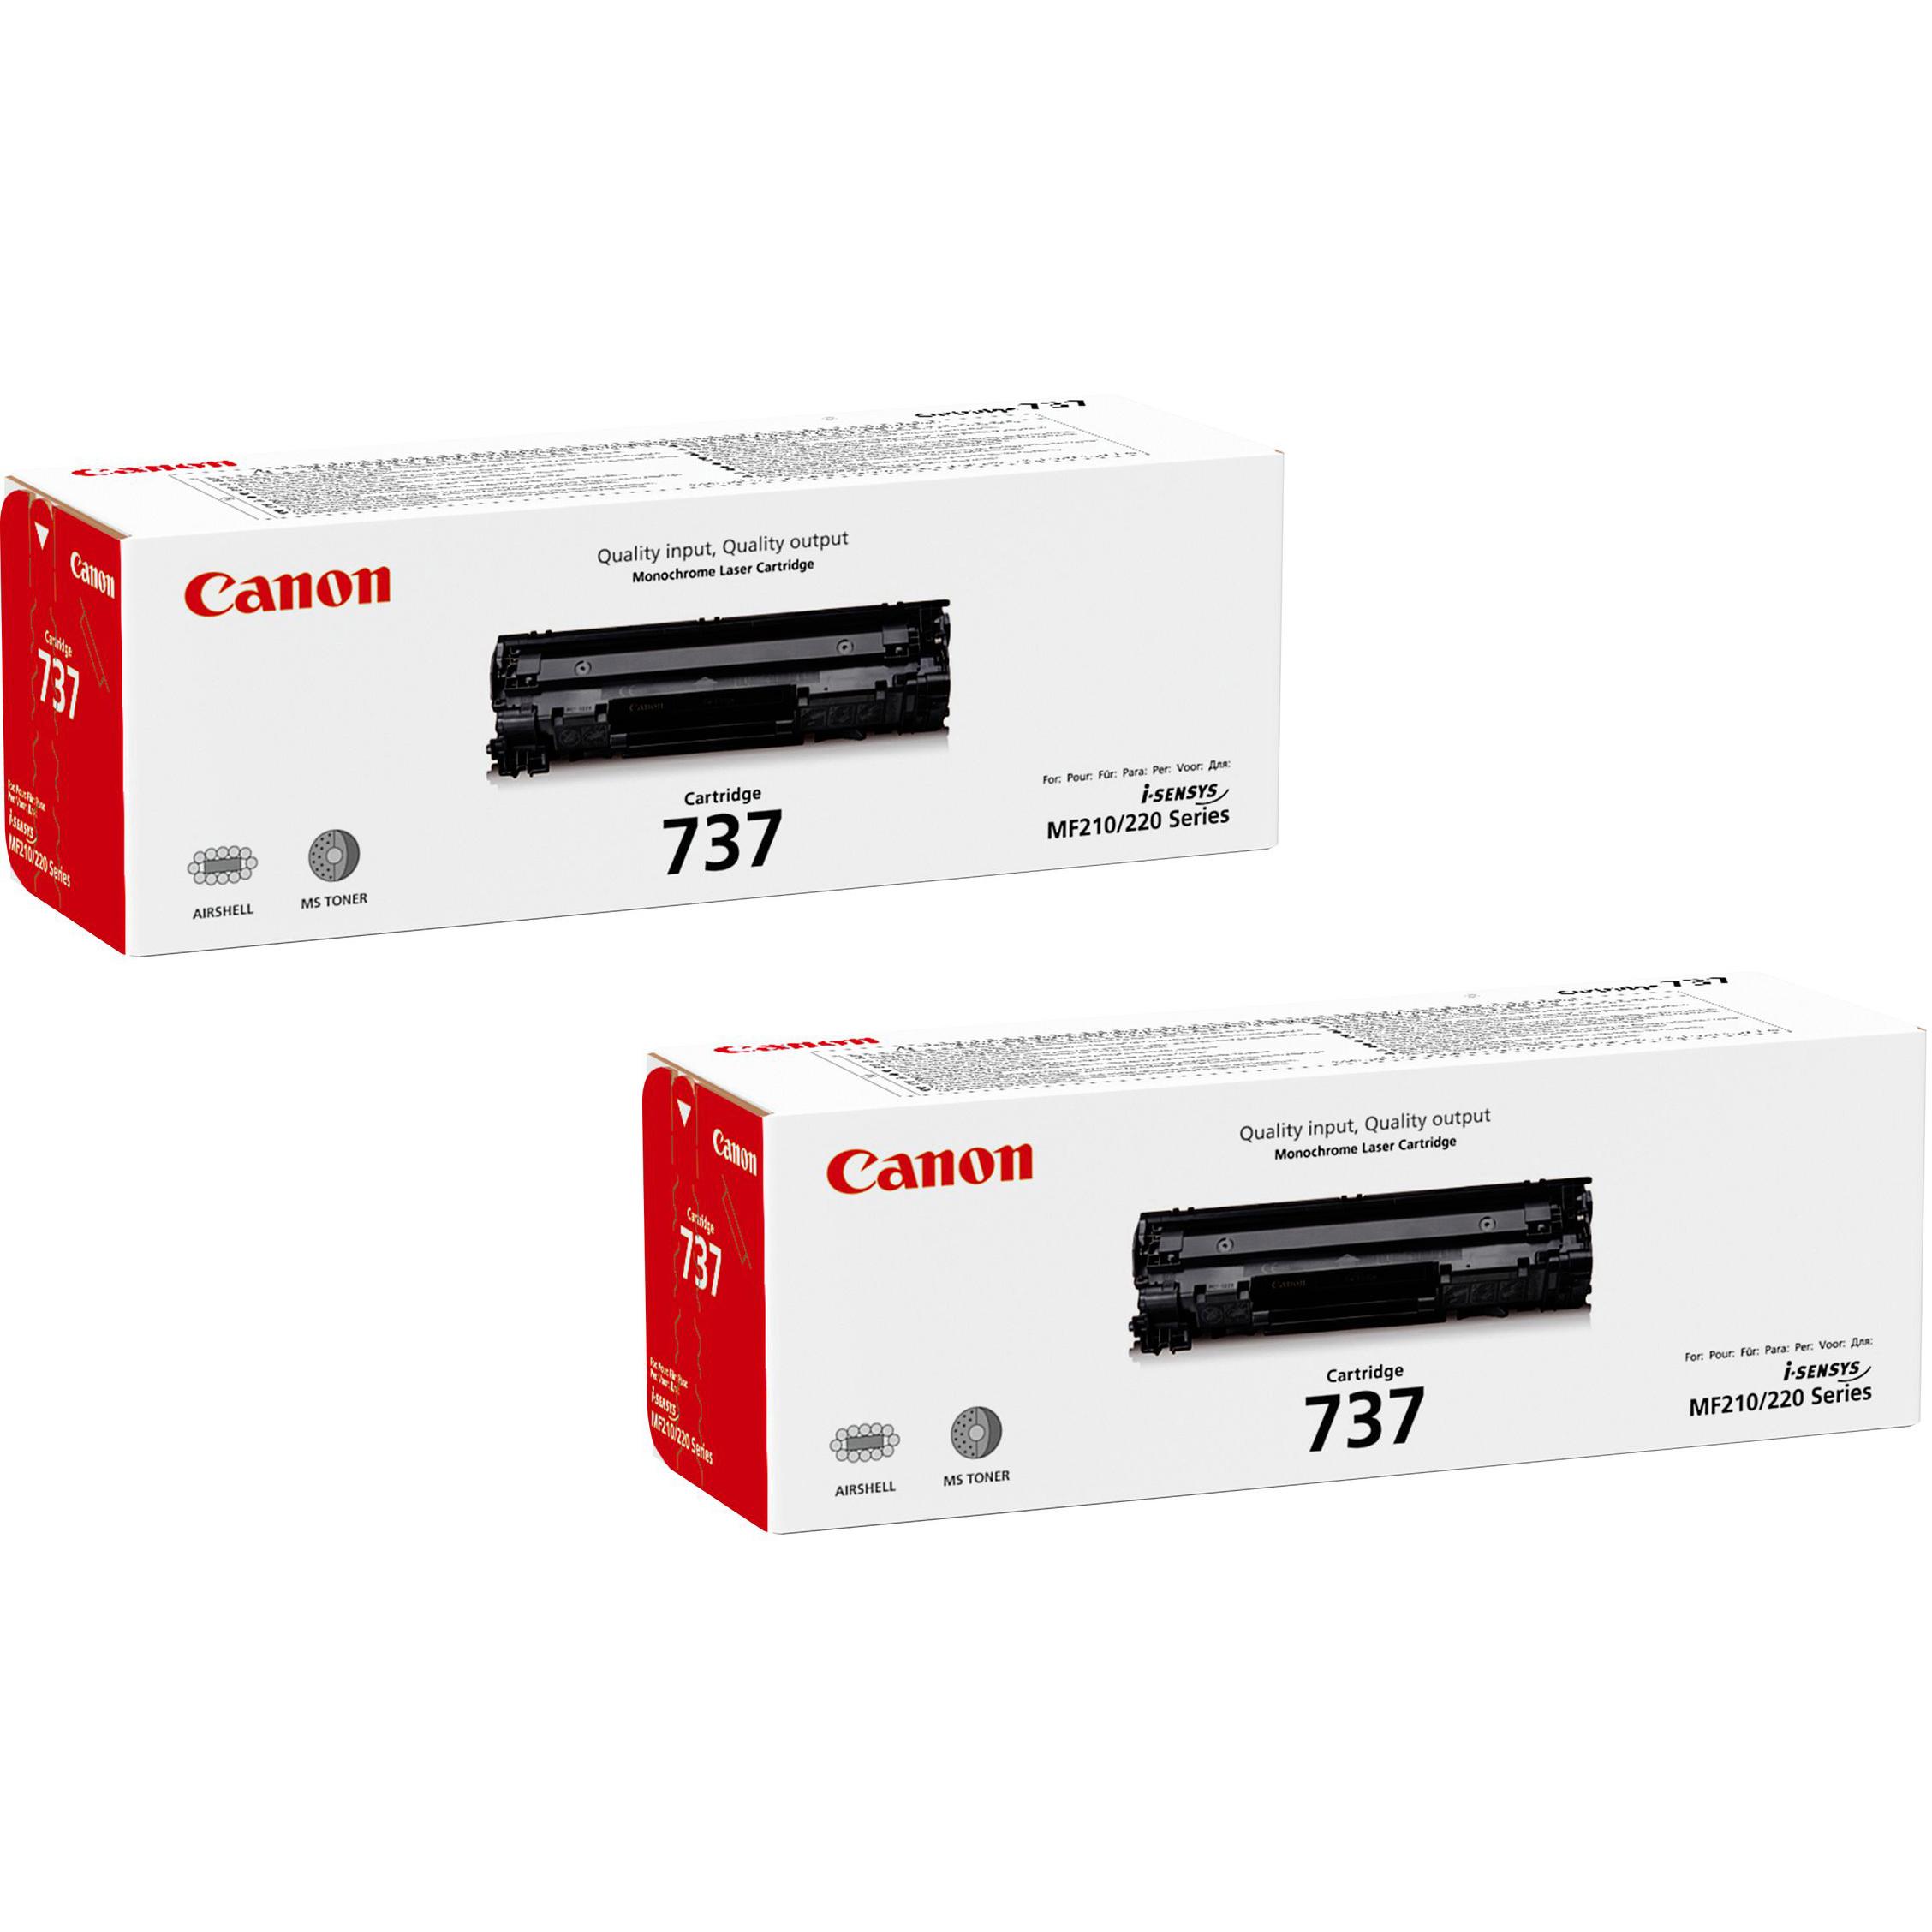 Original Canon 737 Black Twin Pack Toner Cartridges (9435B002)